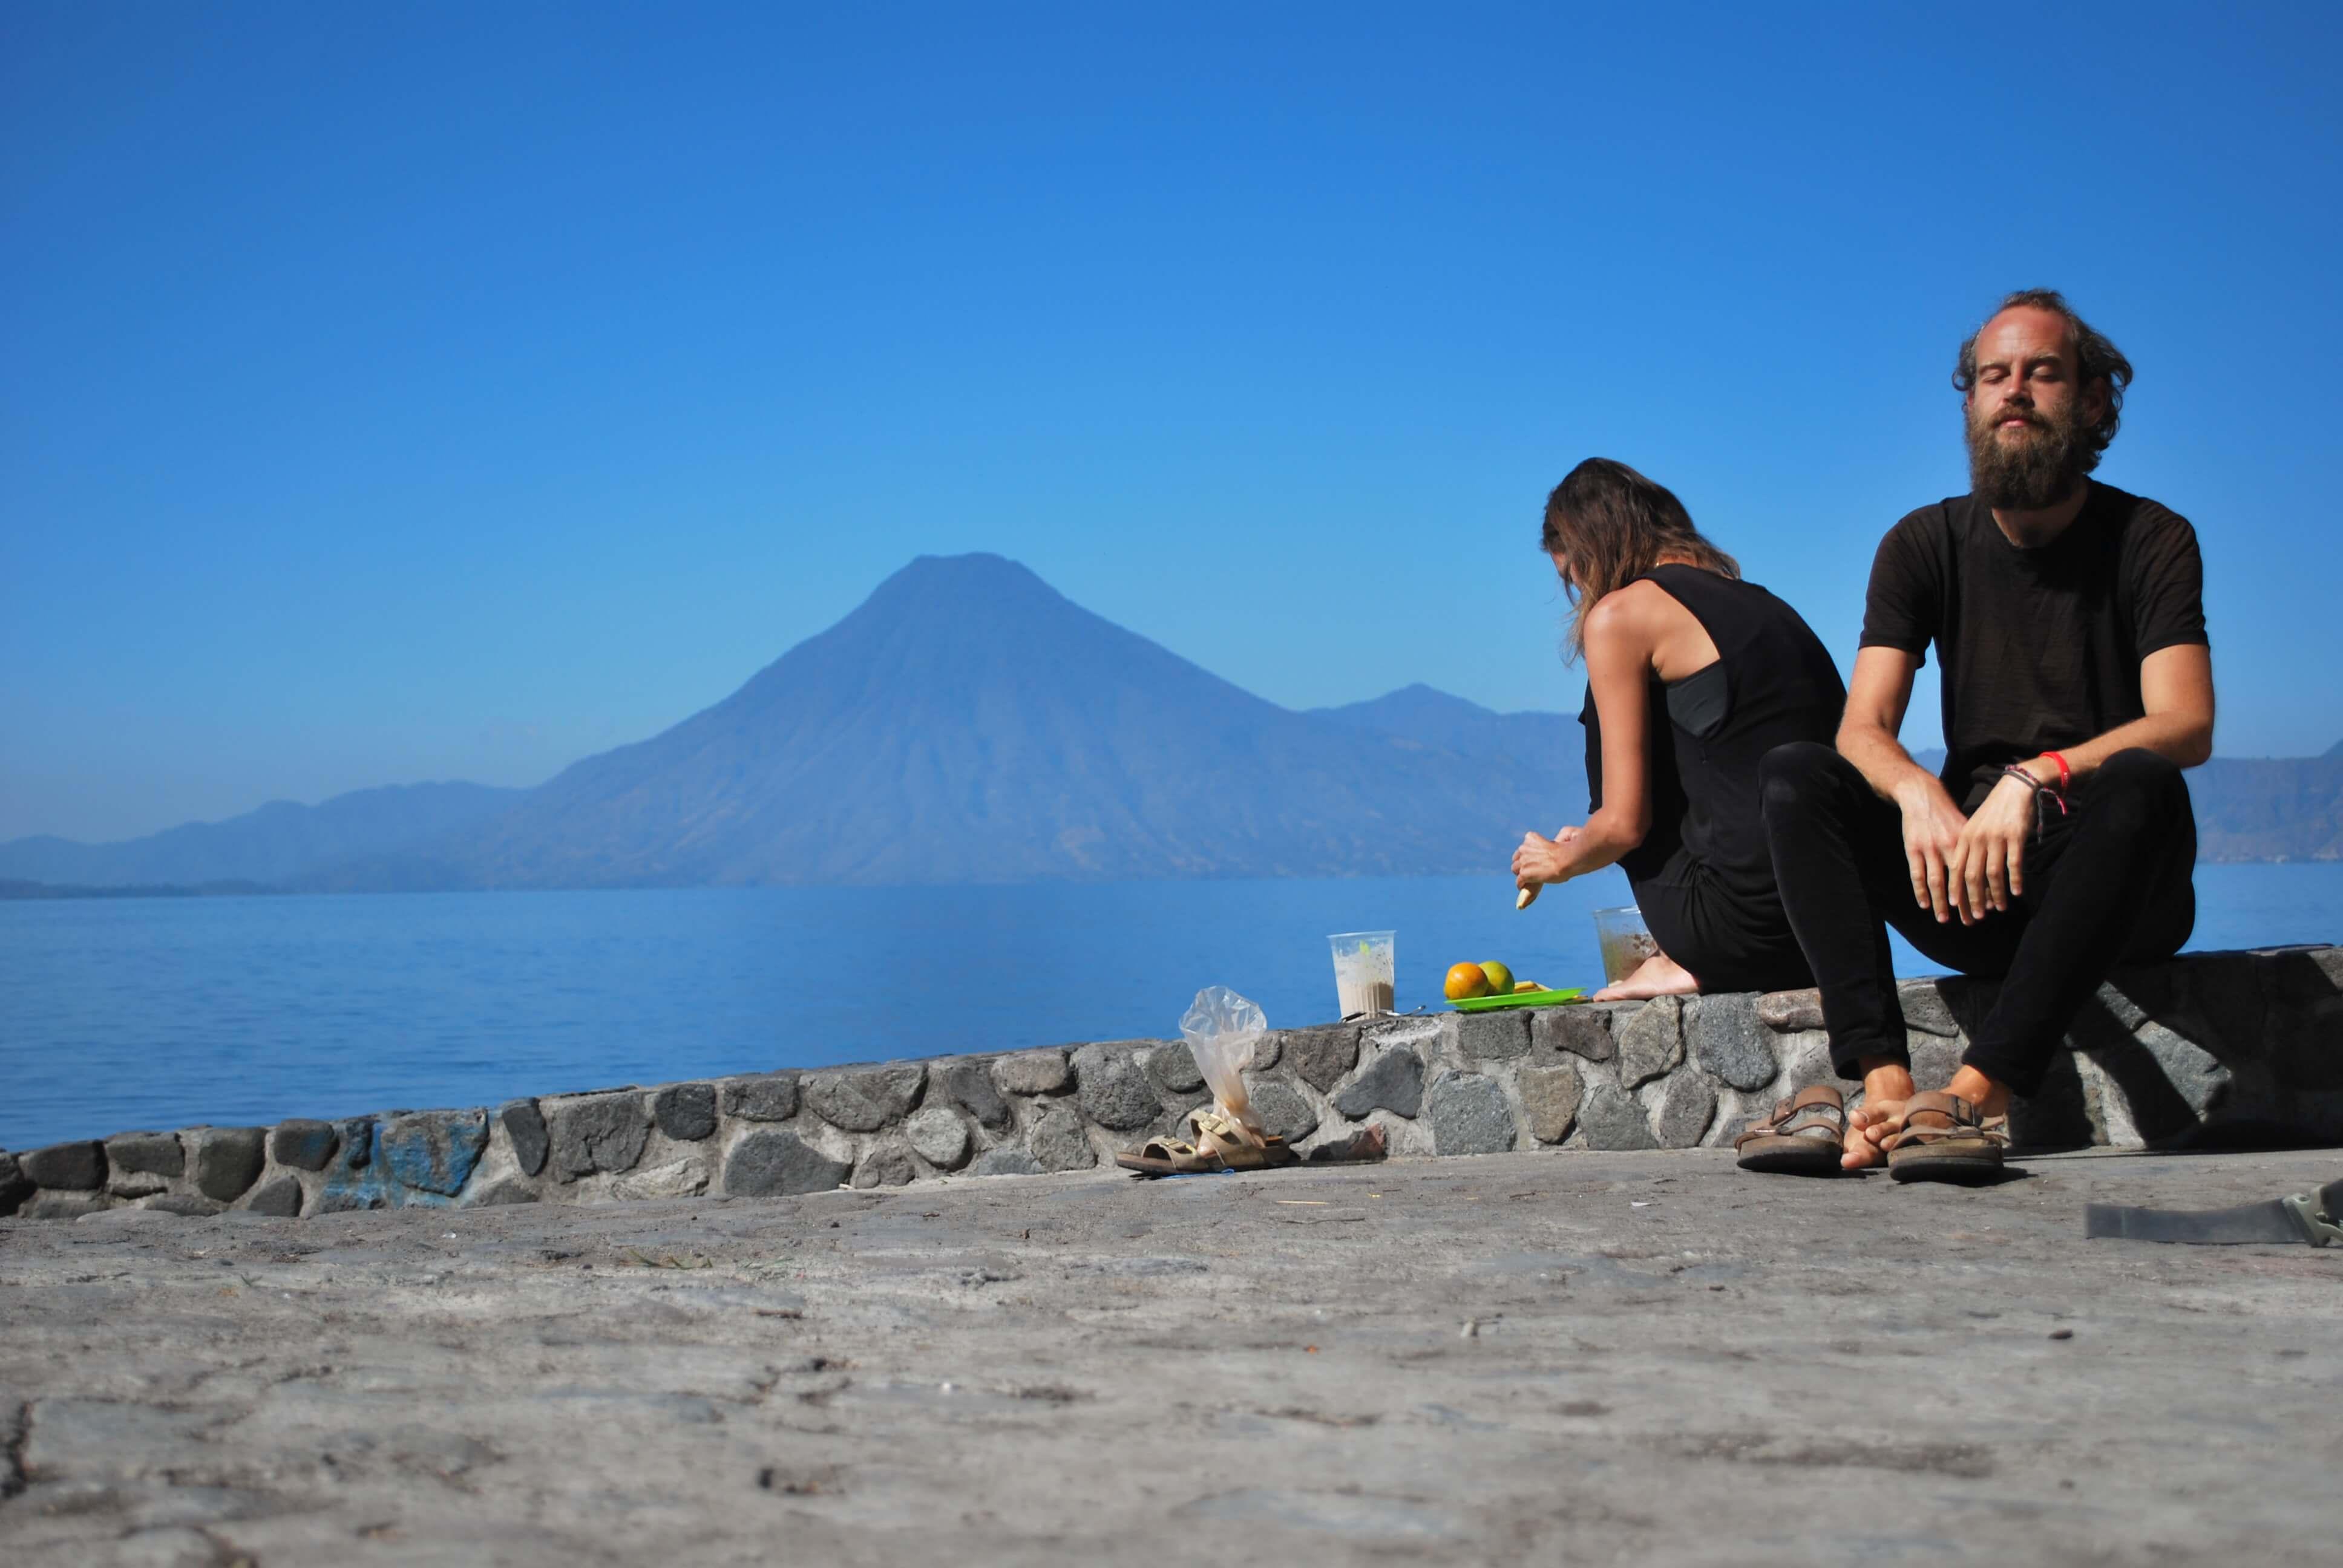 Meet theperfectstrugglers at Lake Atitlan